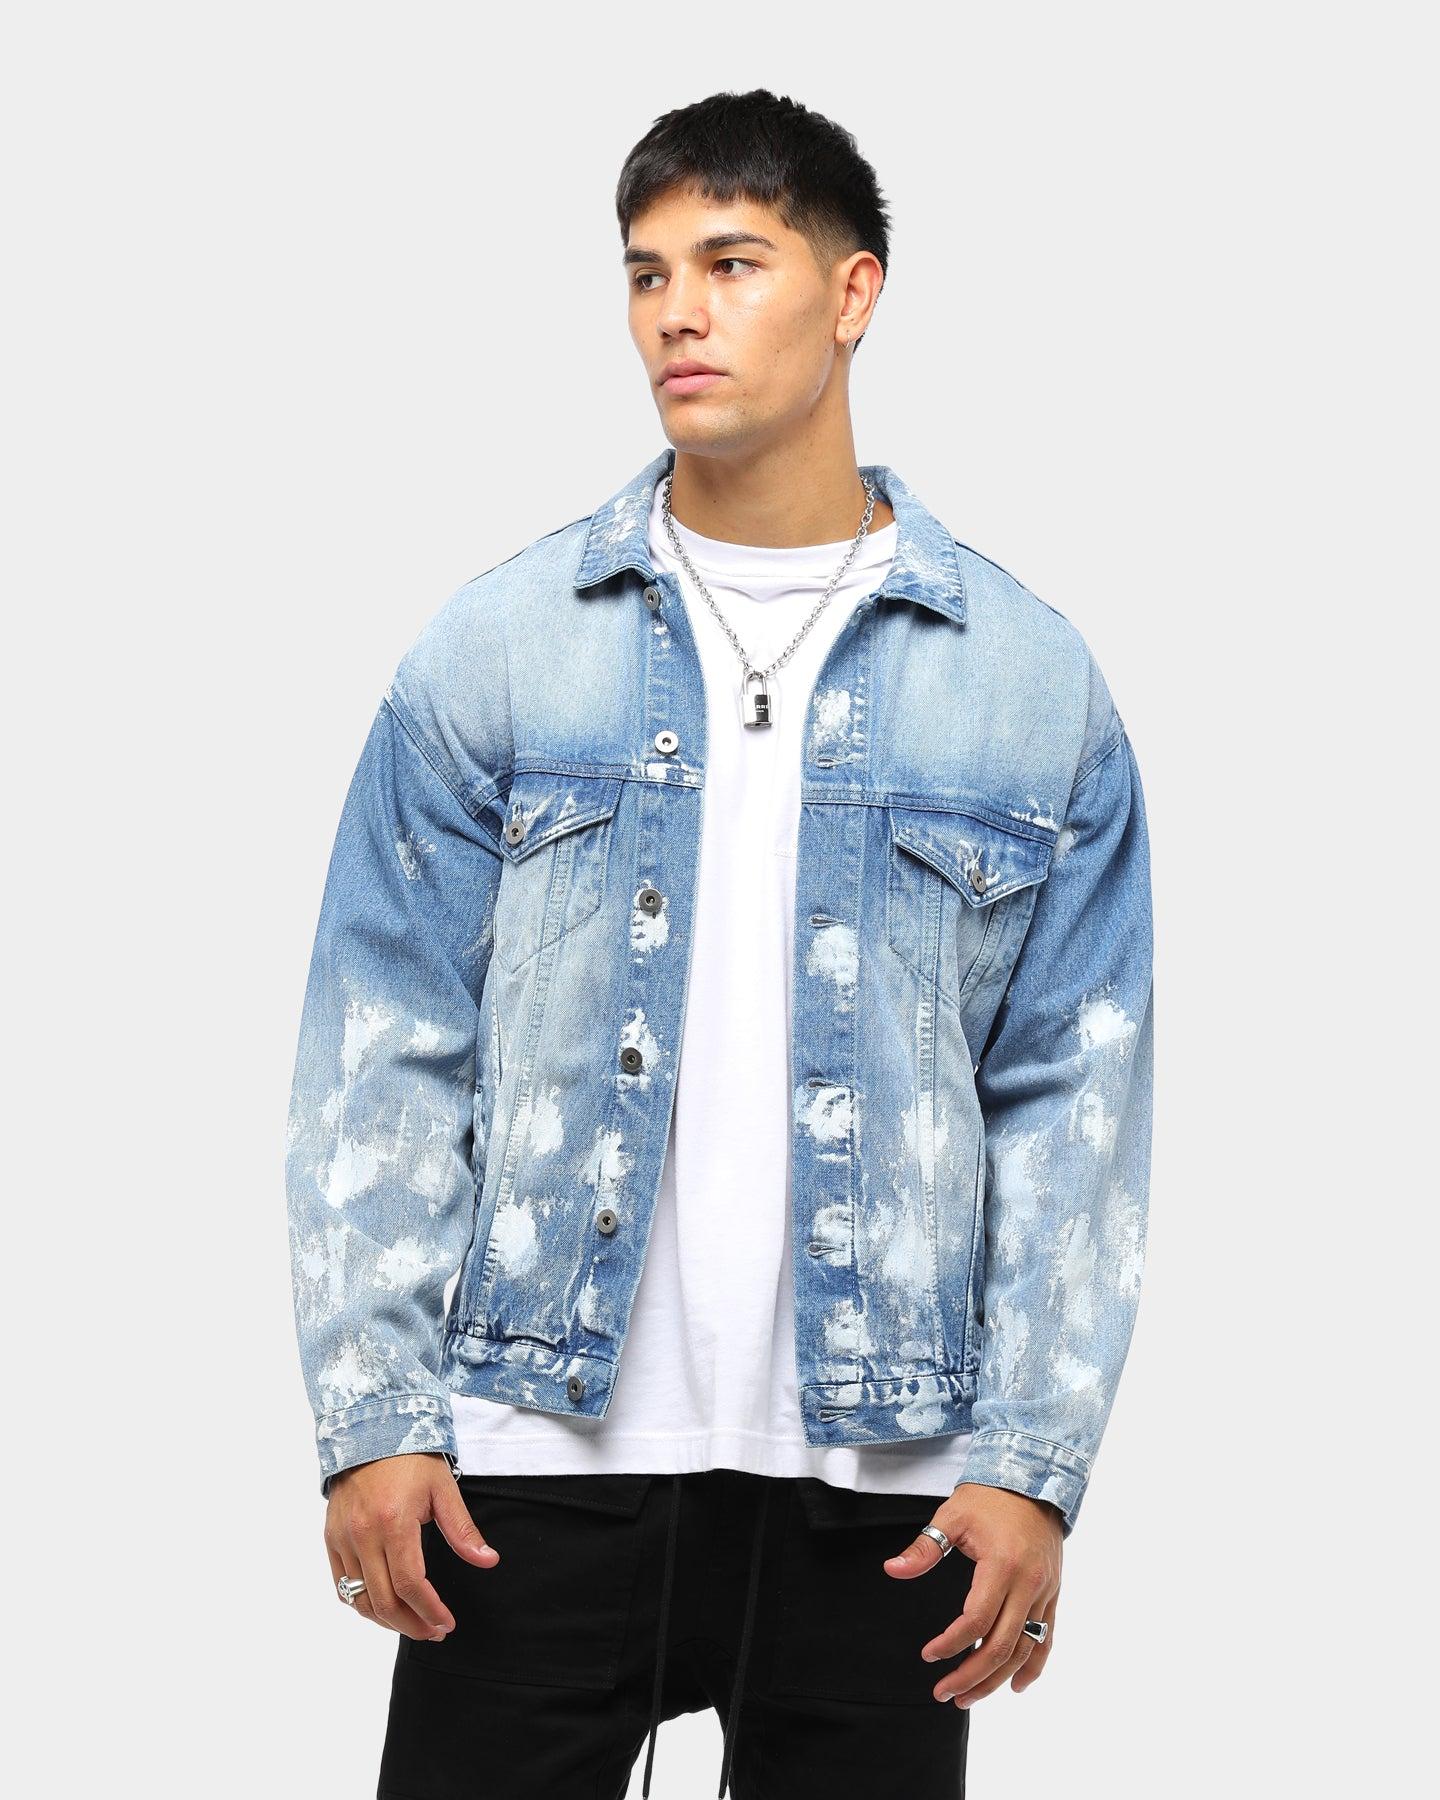 Men's Jackets Shop Jackets & Coats For Men Online